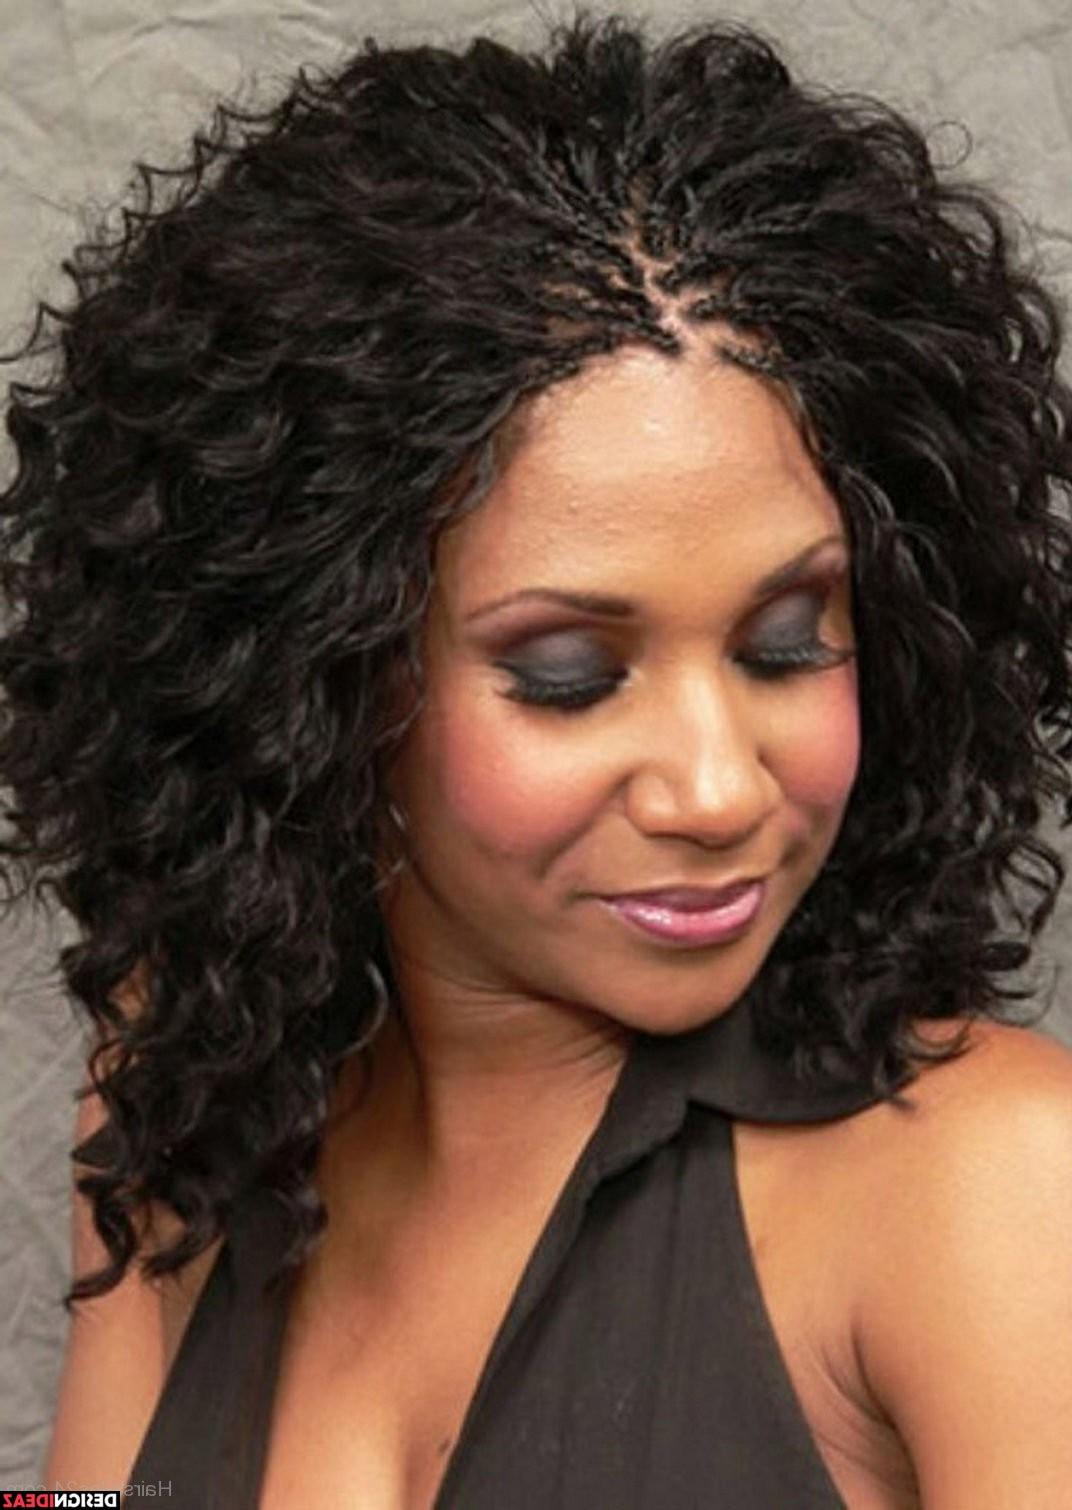 10 Sexy Short Black Braided Messy Hairstyles Pertaining To Shorter Black Messy Hairstyles (View 4 of 20)